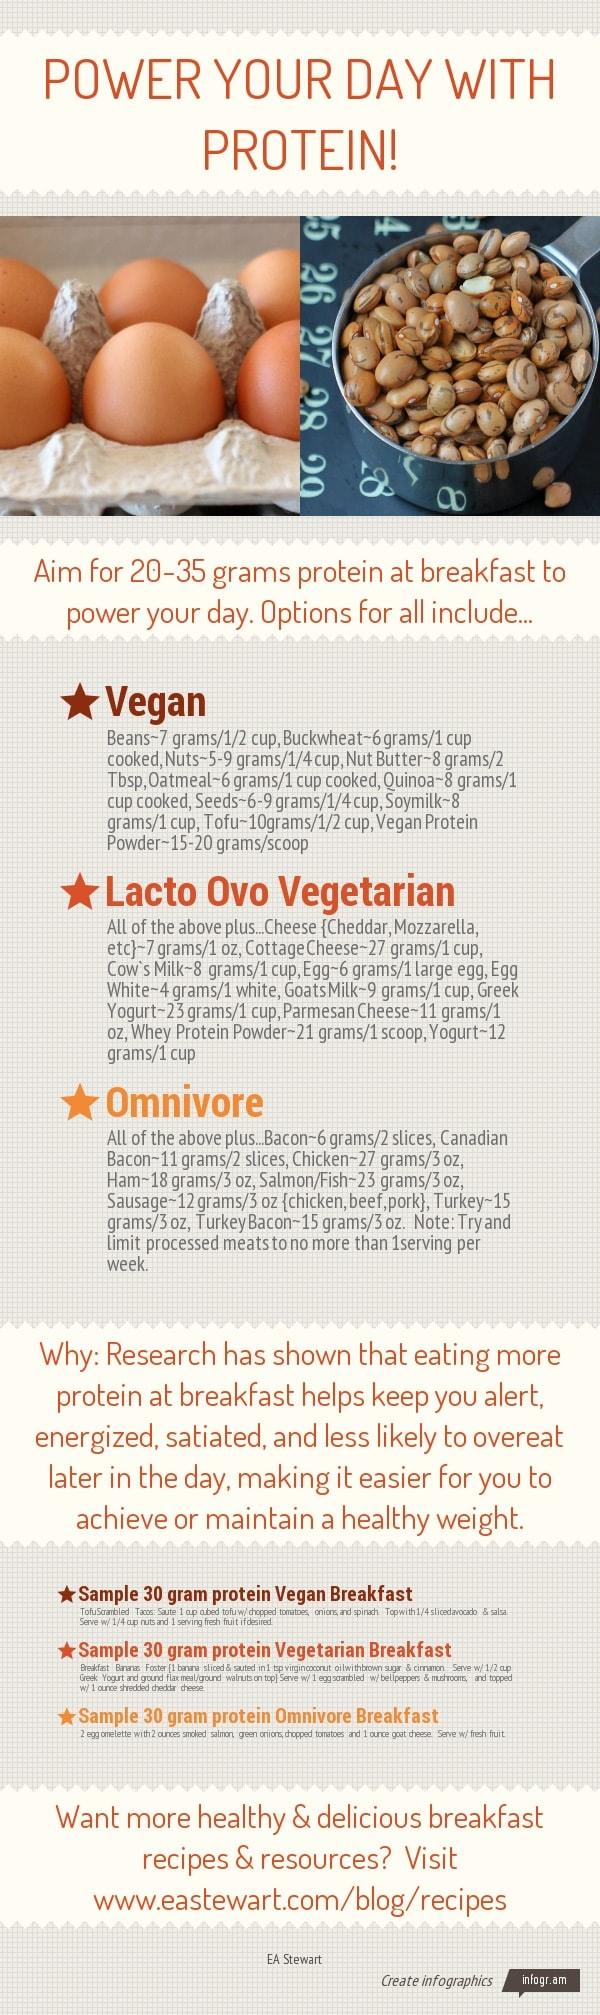 high protein breakfast ideas infographic